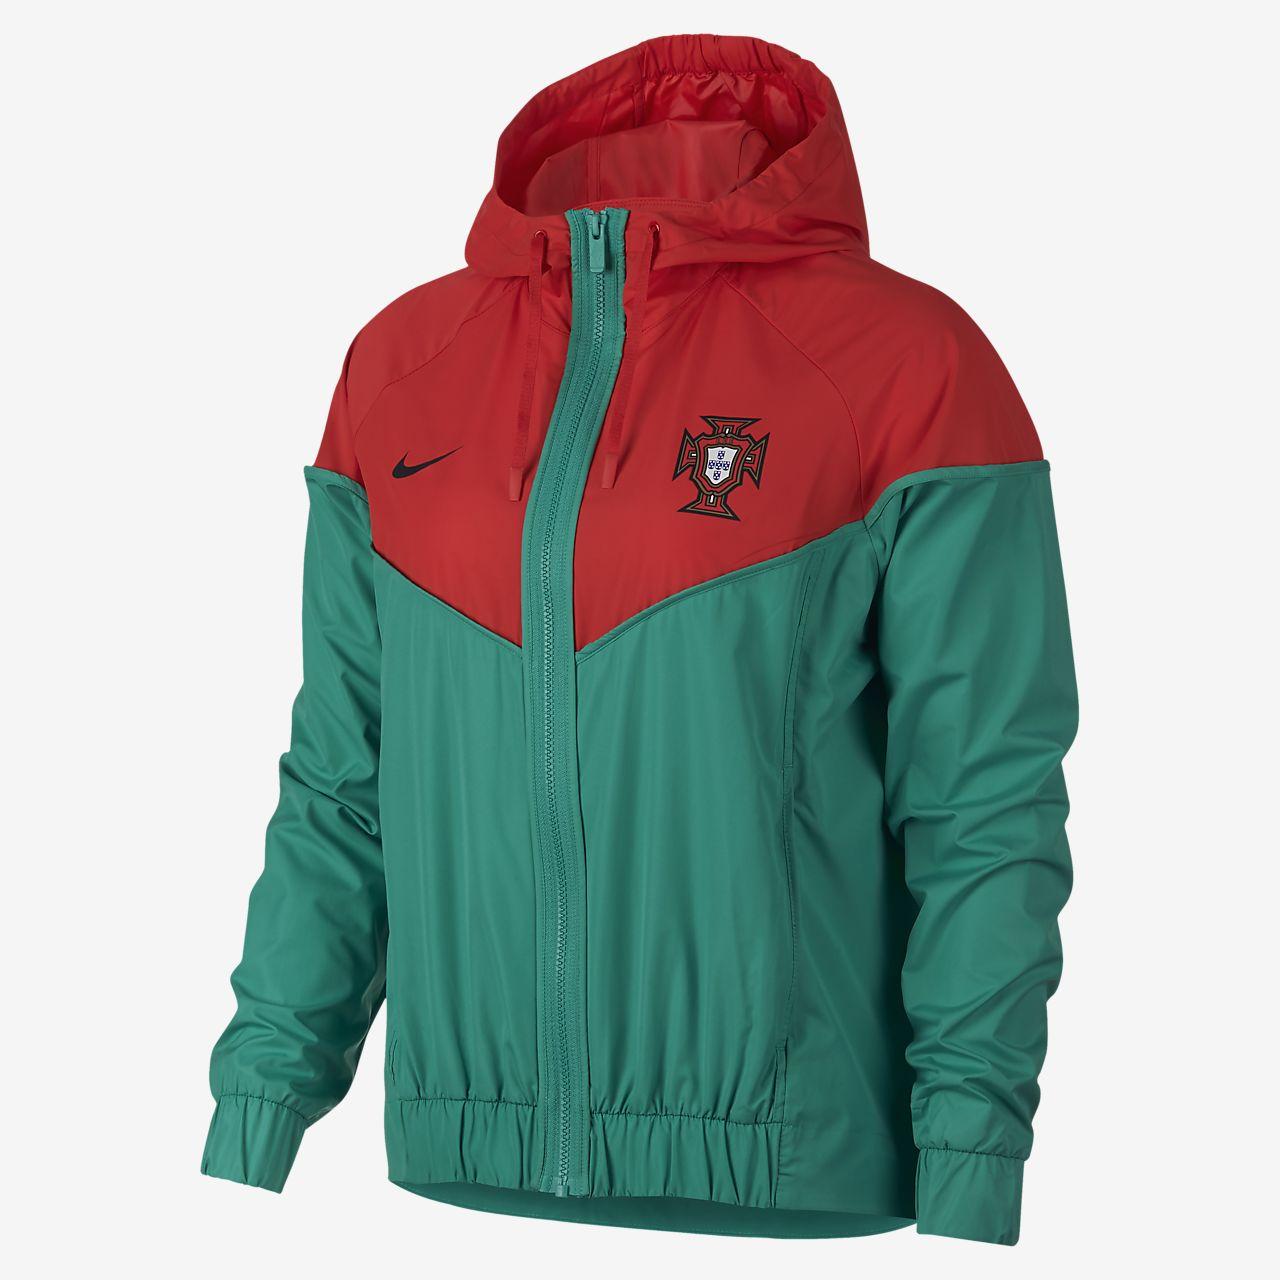 87109186f85b Portugal Windrunner Women s Jacket. Nike.com AU